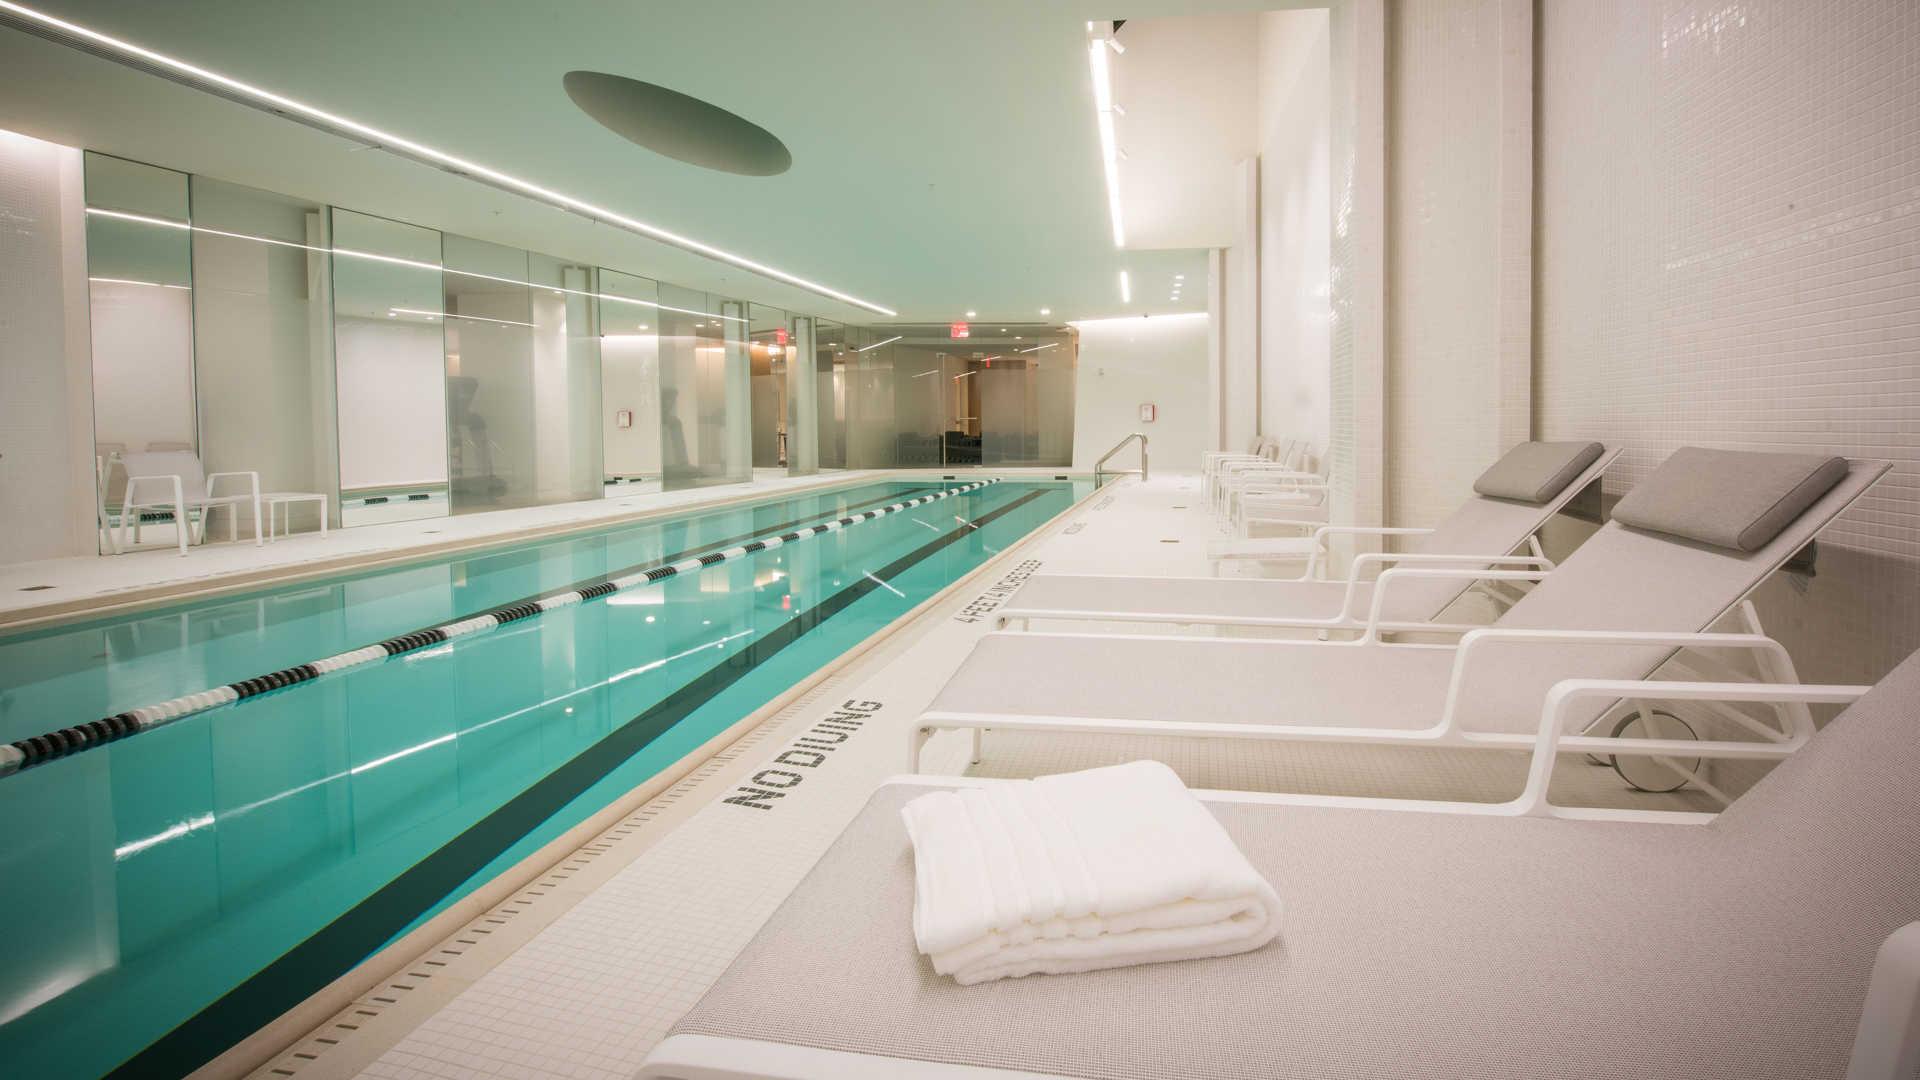 60-foot Indoor Lap Pool